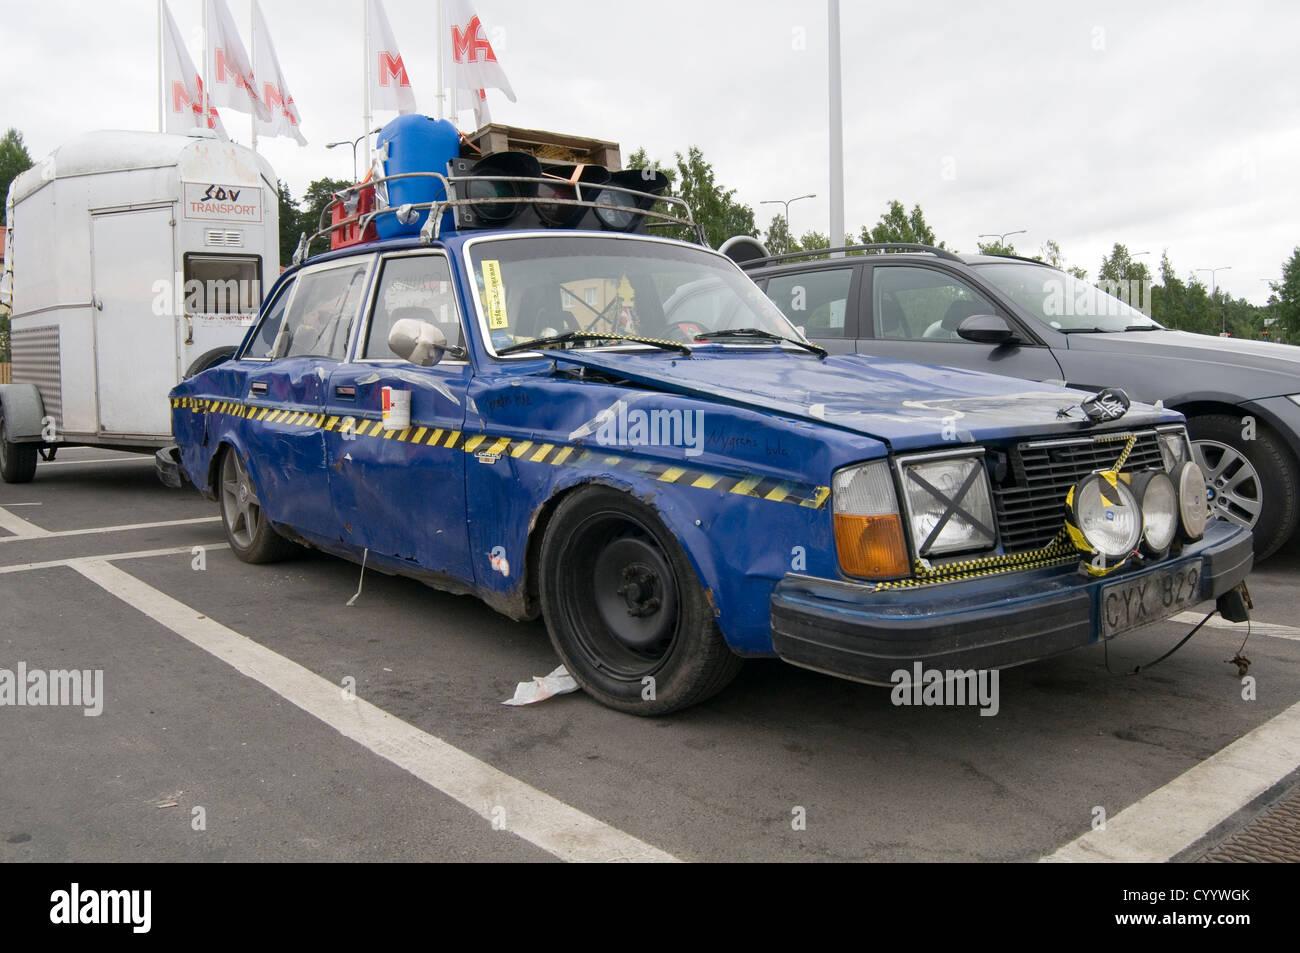 beat up old banger car cars tatty rough knackered junk scrap volvo dent dented smashed up